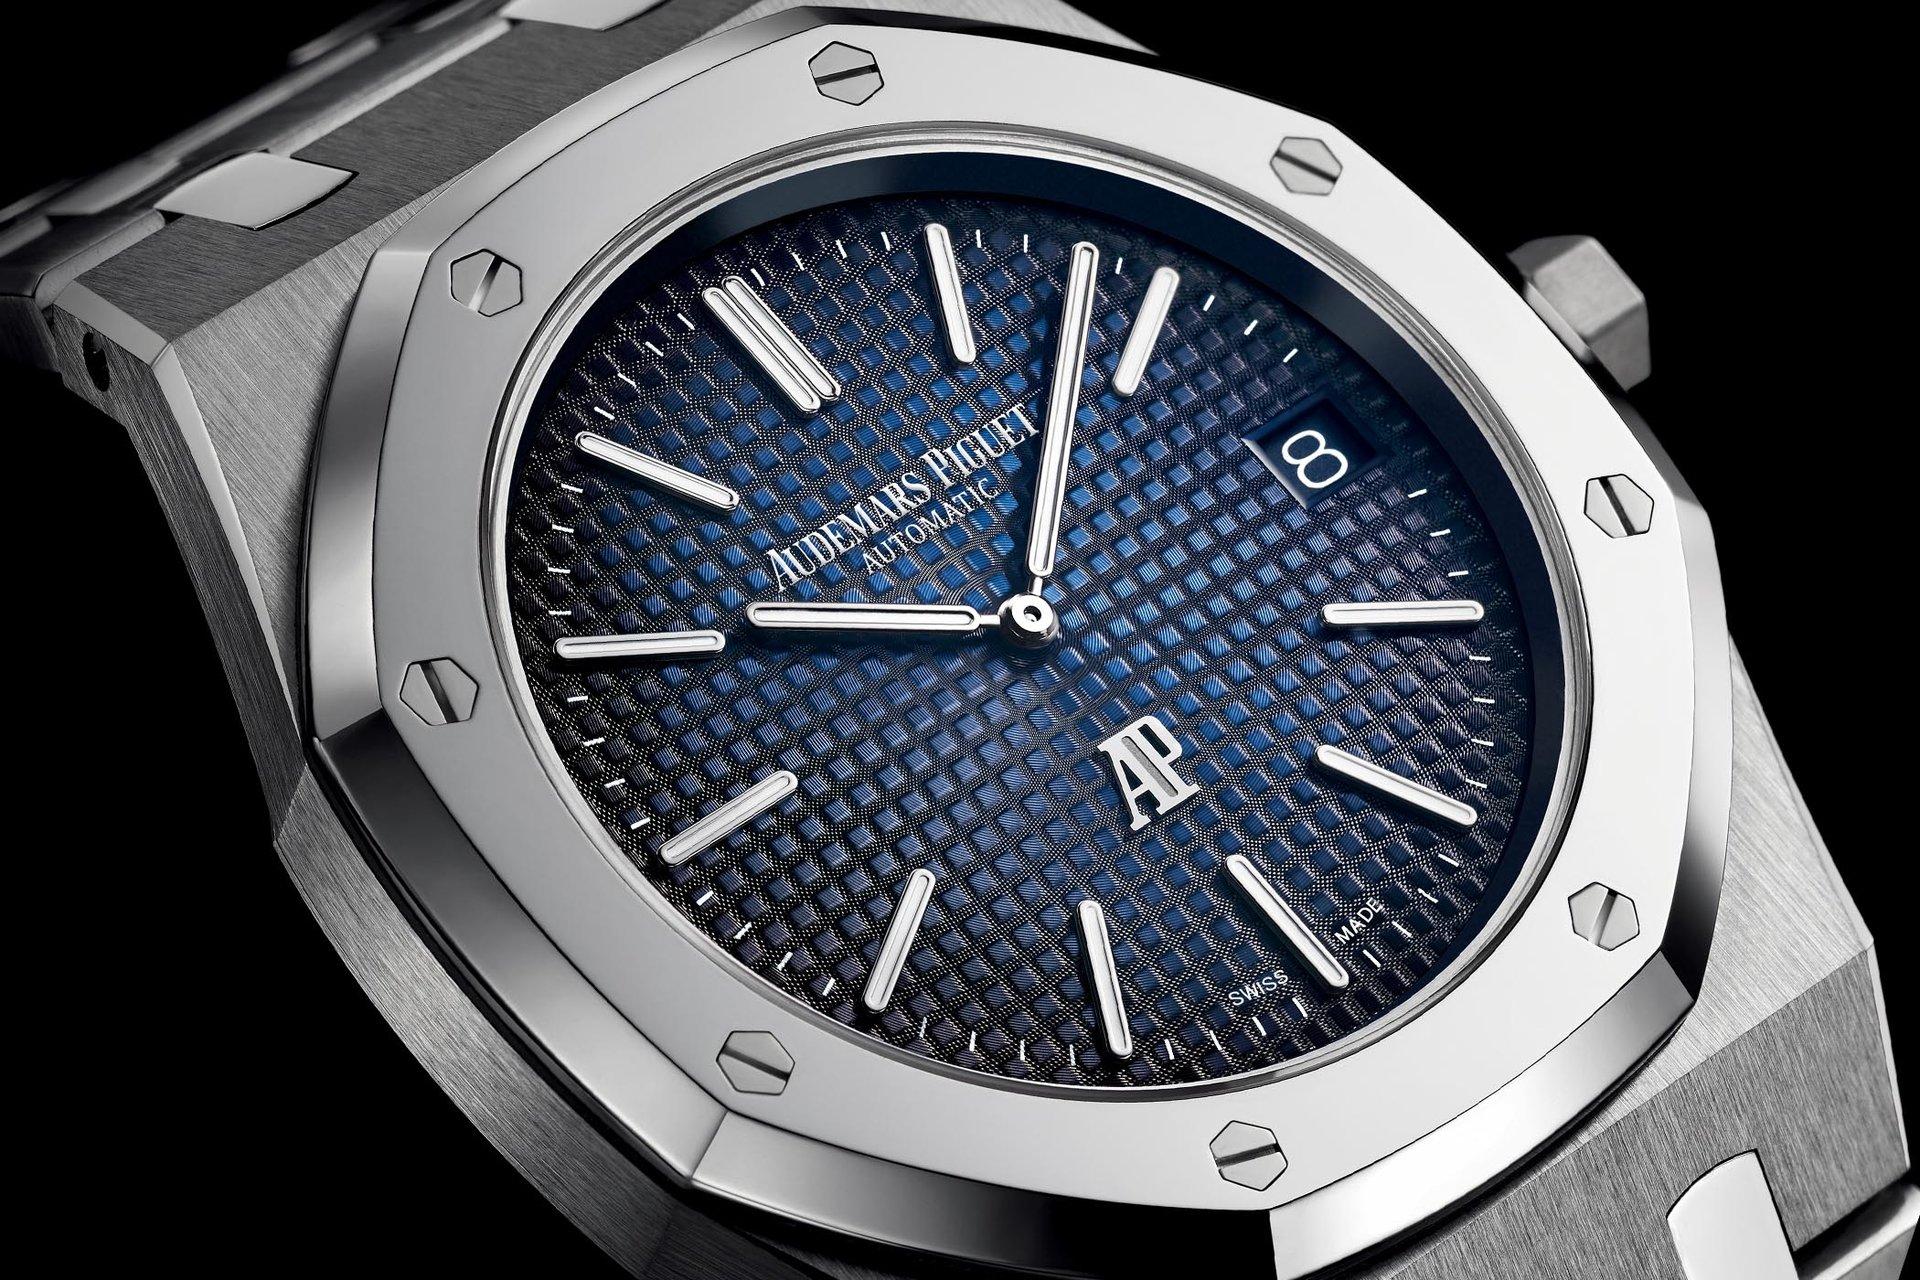 Audemars-Piguet-Royal-Oak-Jumbo-Extra-Thin-15202IP-titanium-smoked-blue-dial-SIHH-2018-2.jpg